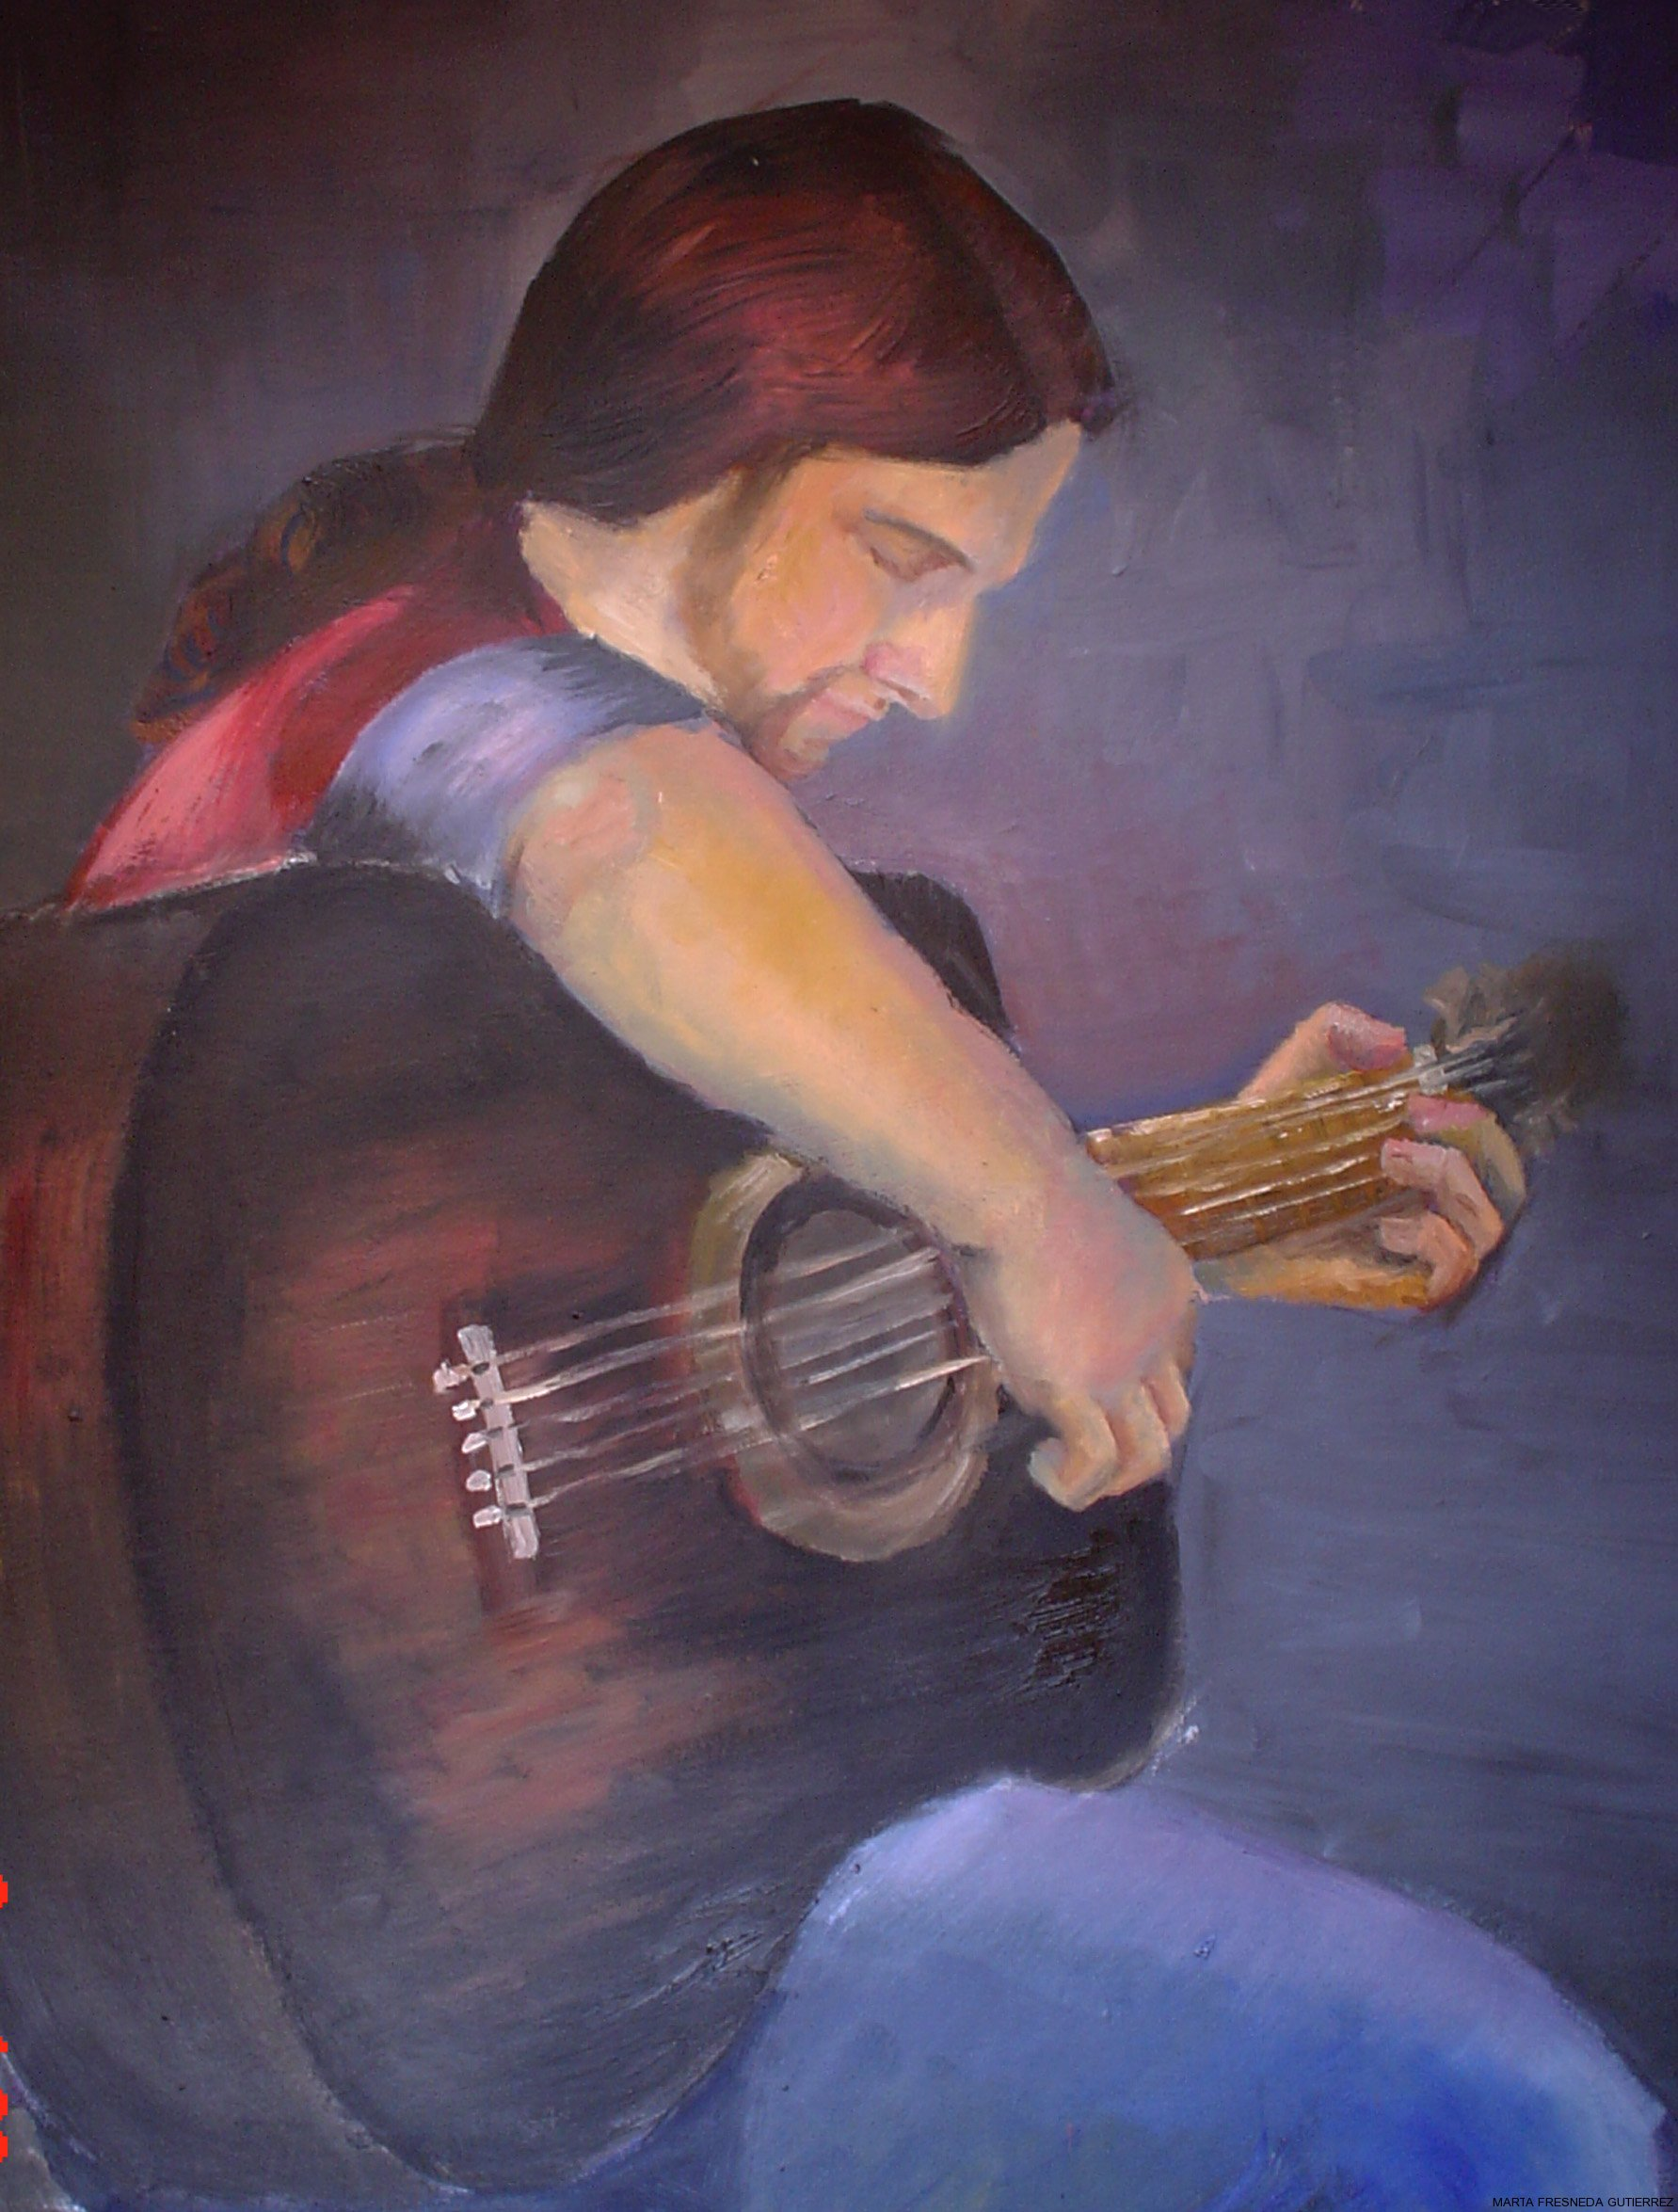 El guitarrista/Il chitarrista